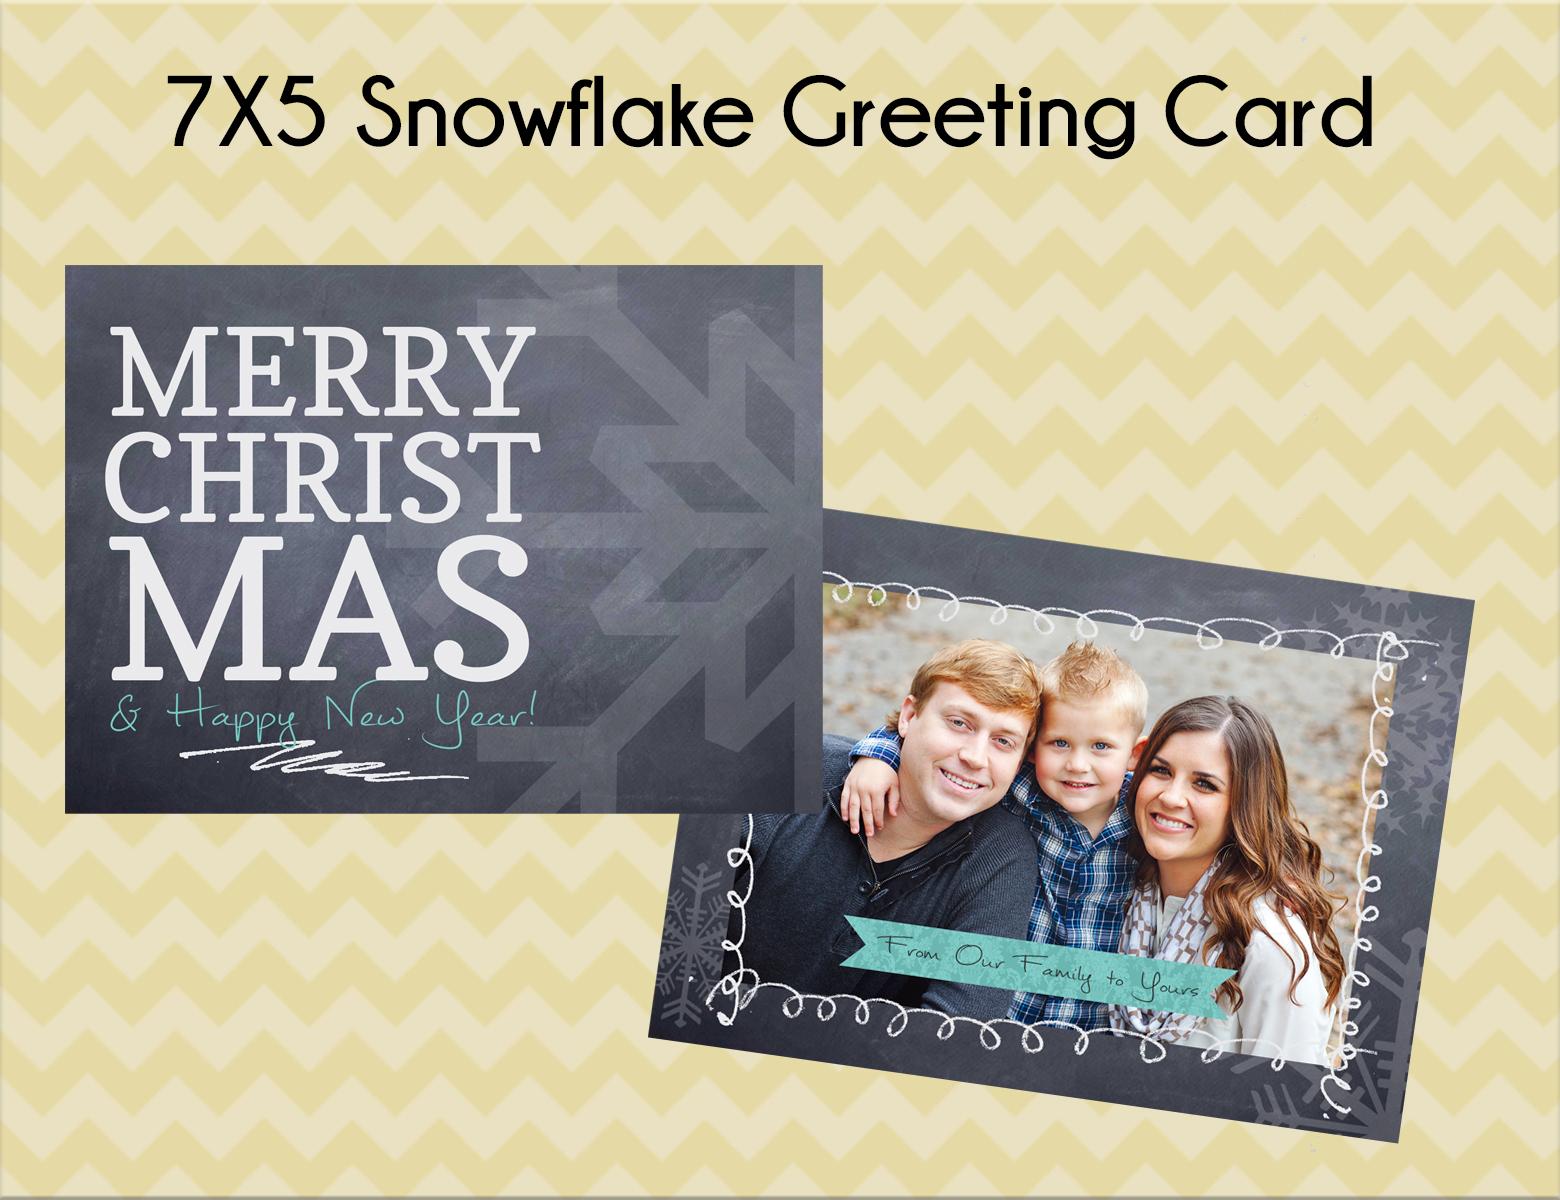 Option #4: 7x5 Snowflake Greeting Card